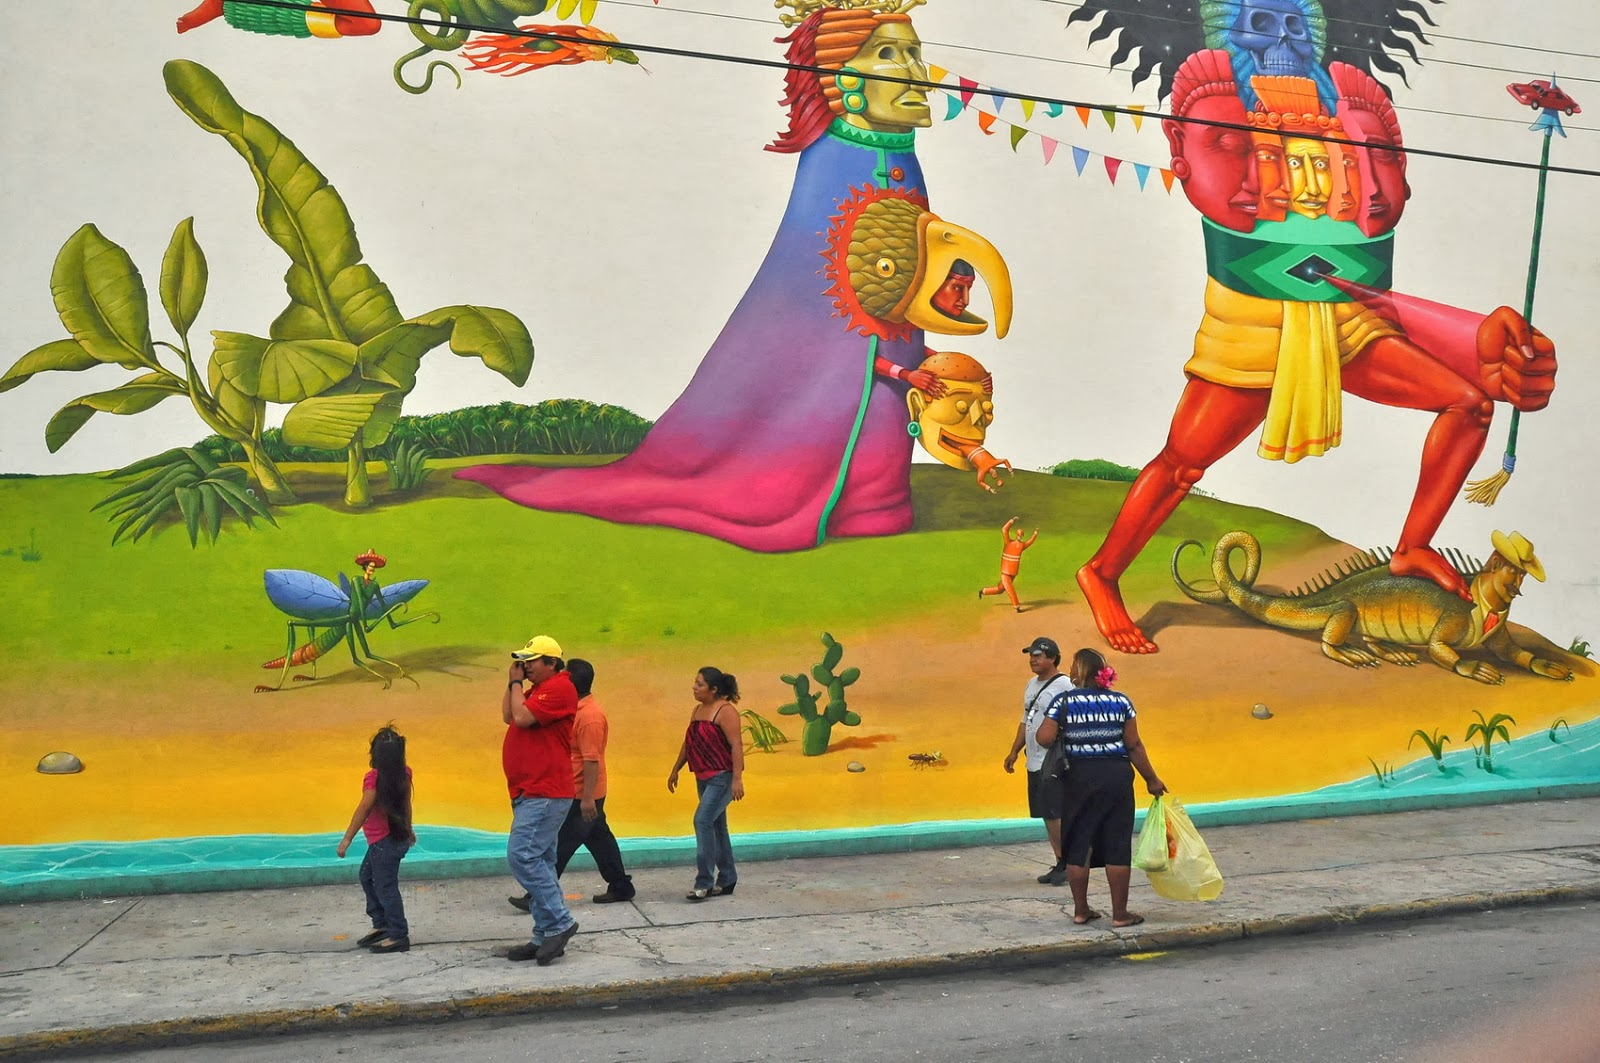 interesni-kazki-new-mural-campeche-mexico-17